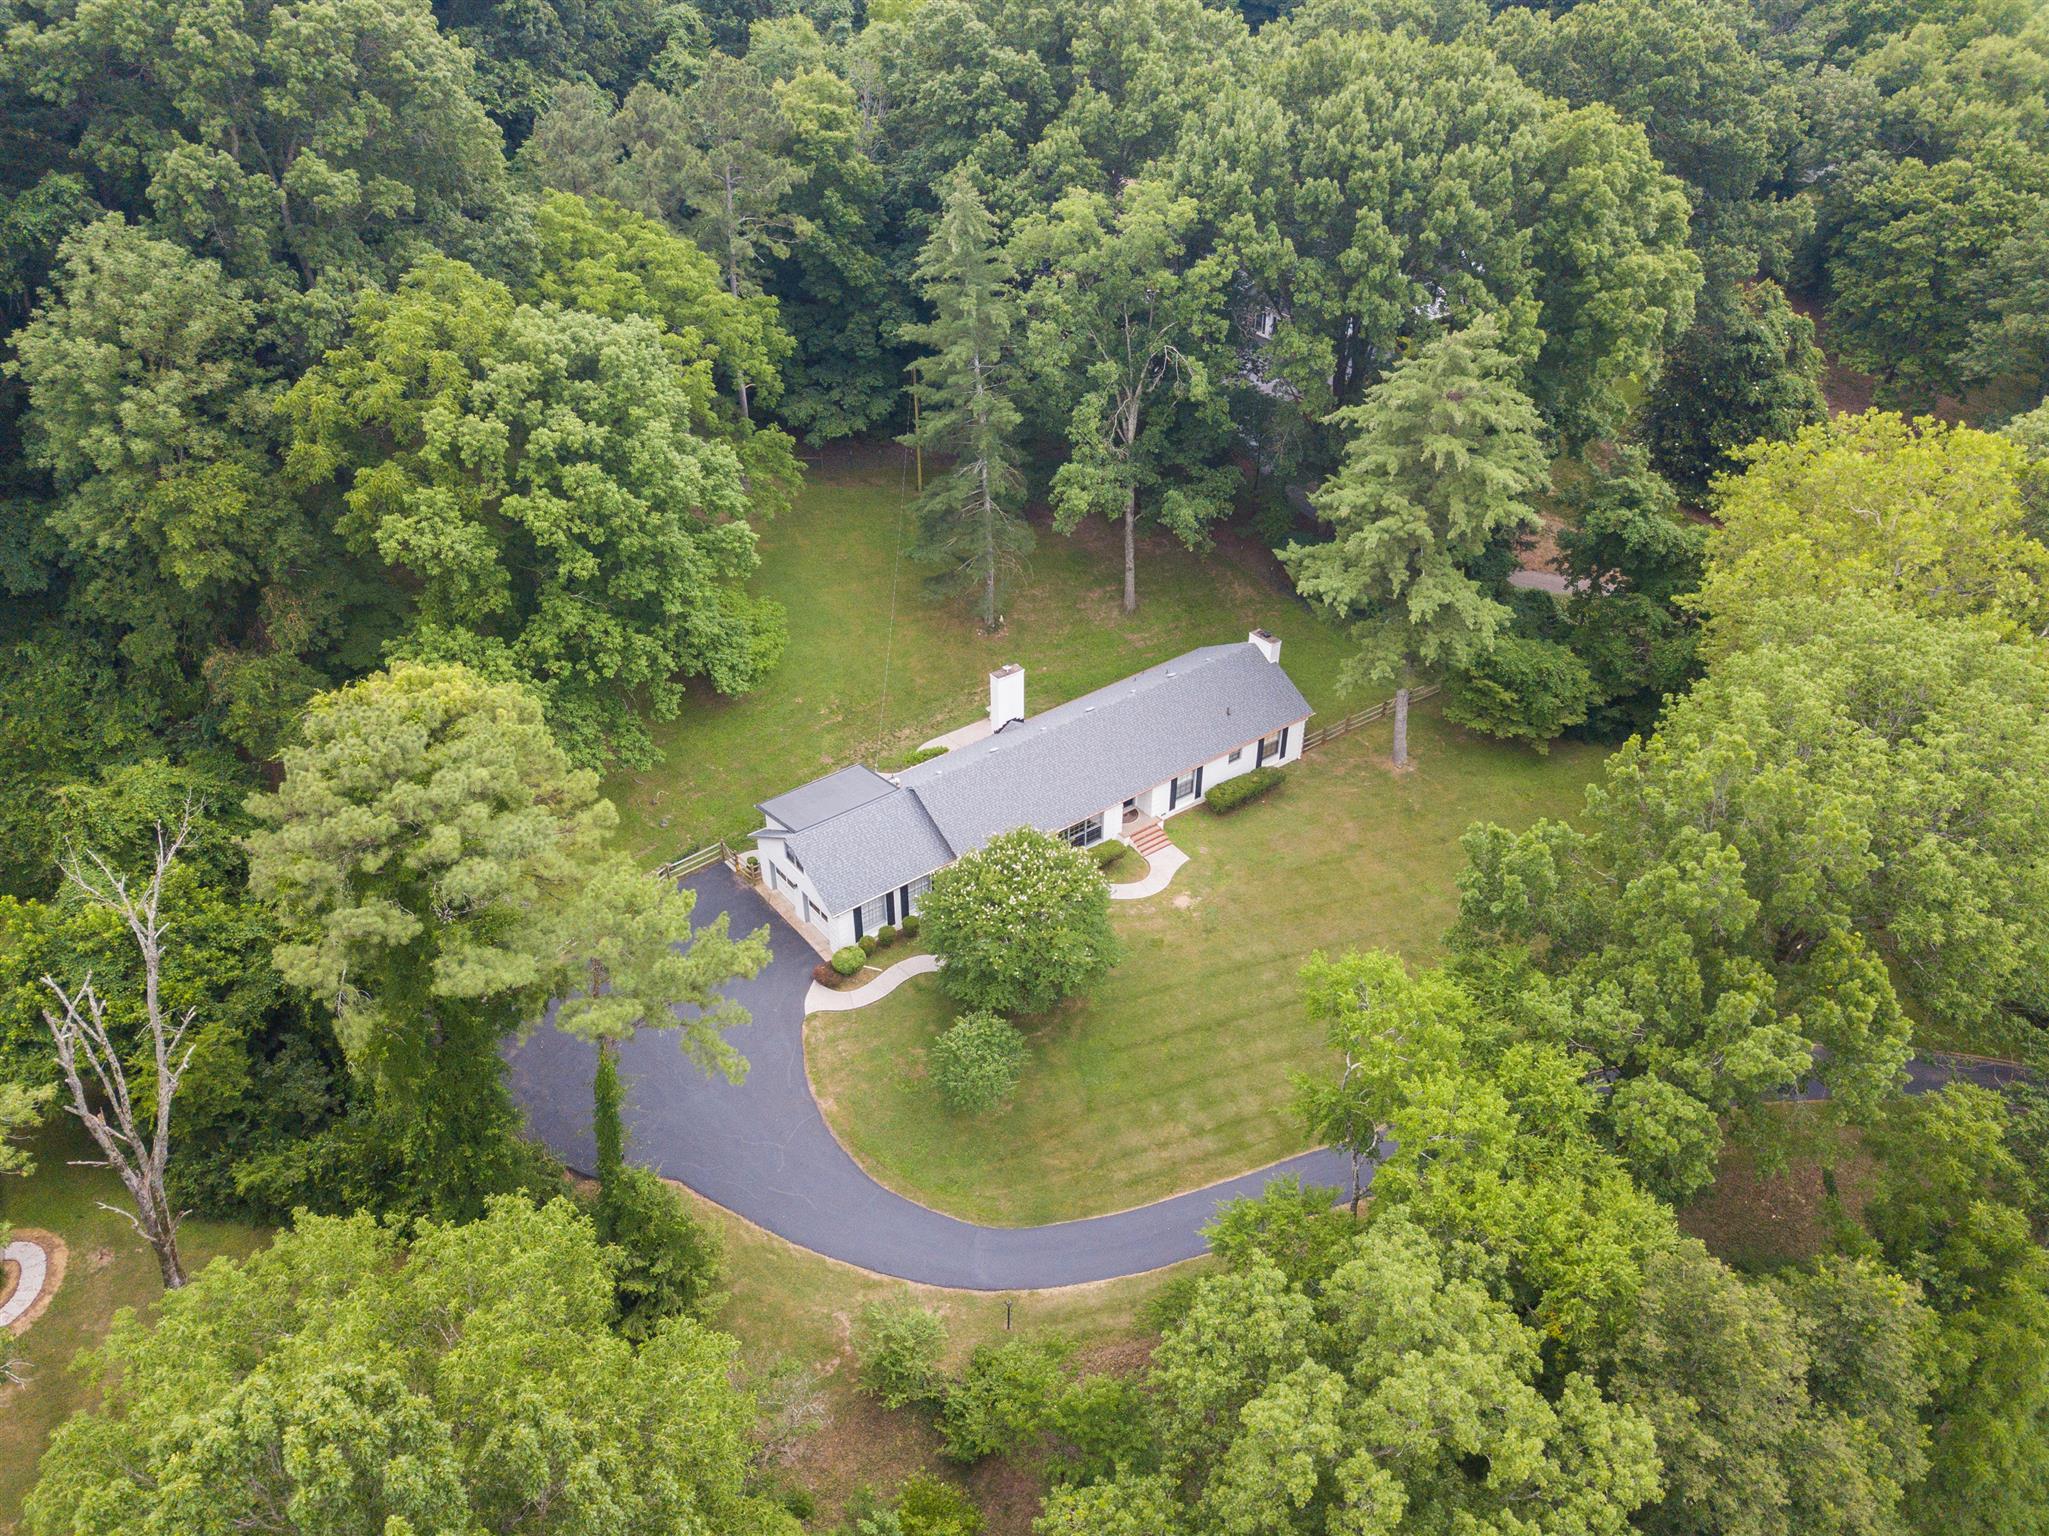 6415 Jocelyn Hollow Rd, Nashville, TN 37205 - Nashville, TN real estate listing